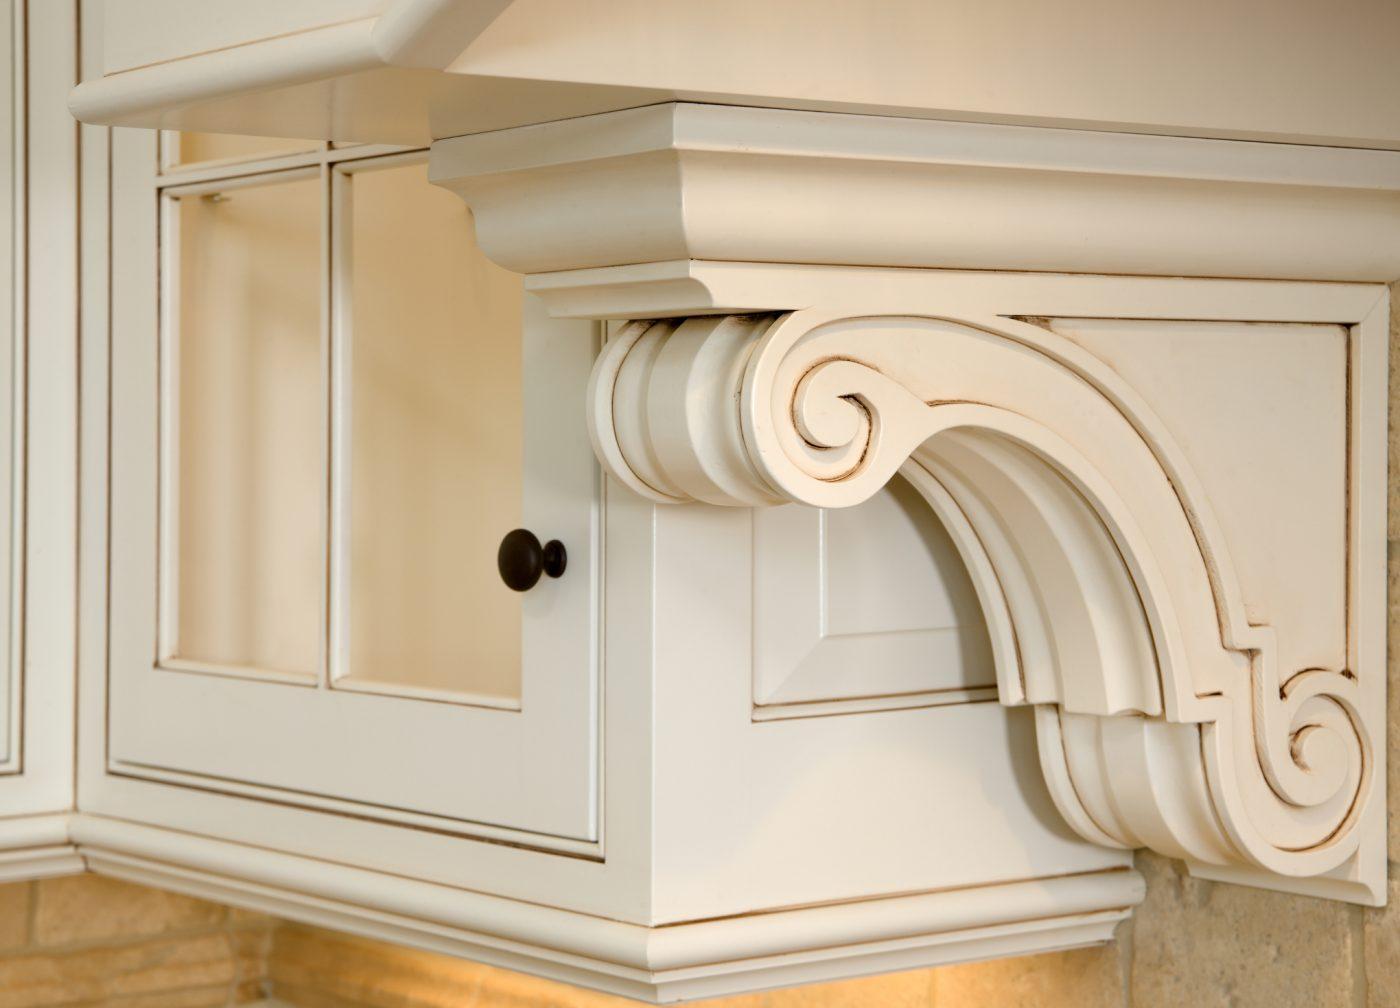 Custom cabinetry in Bethesda